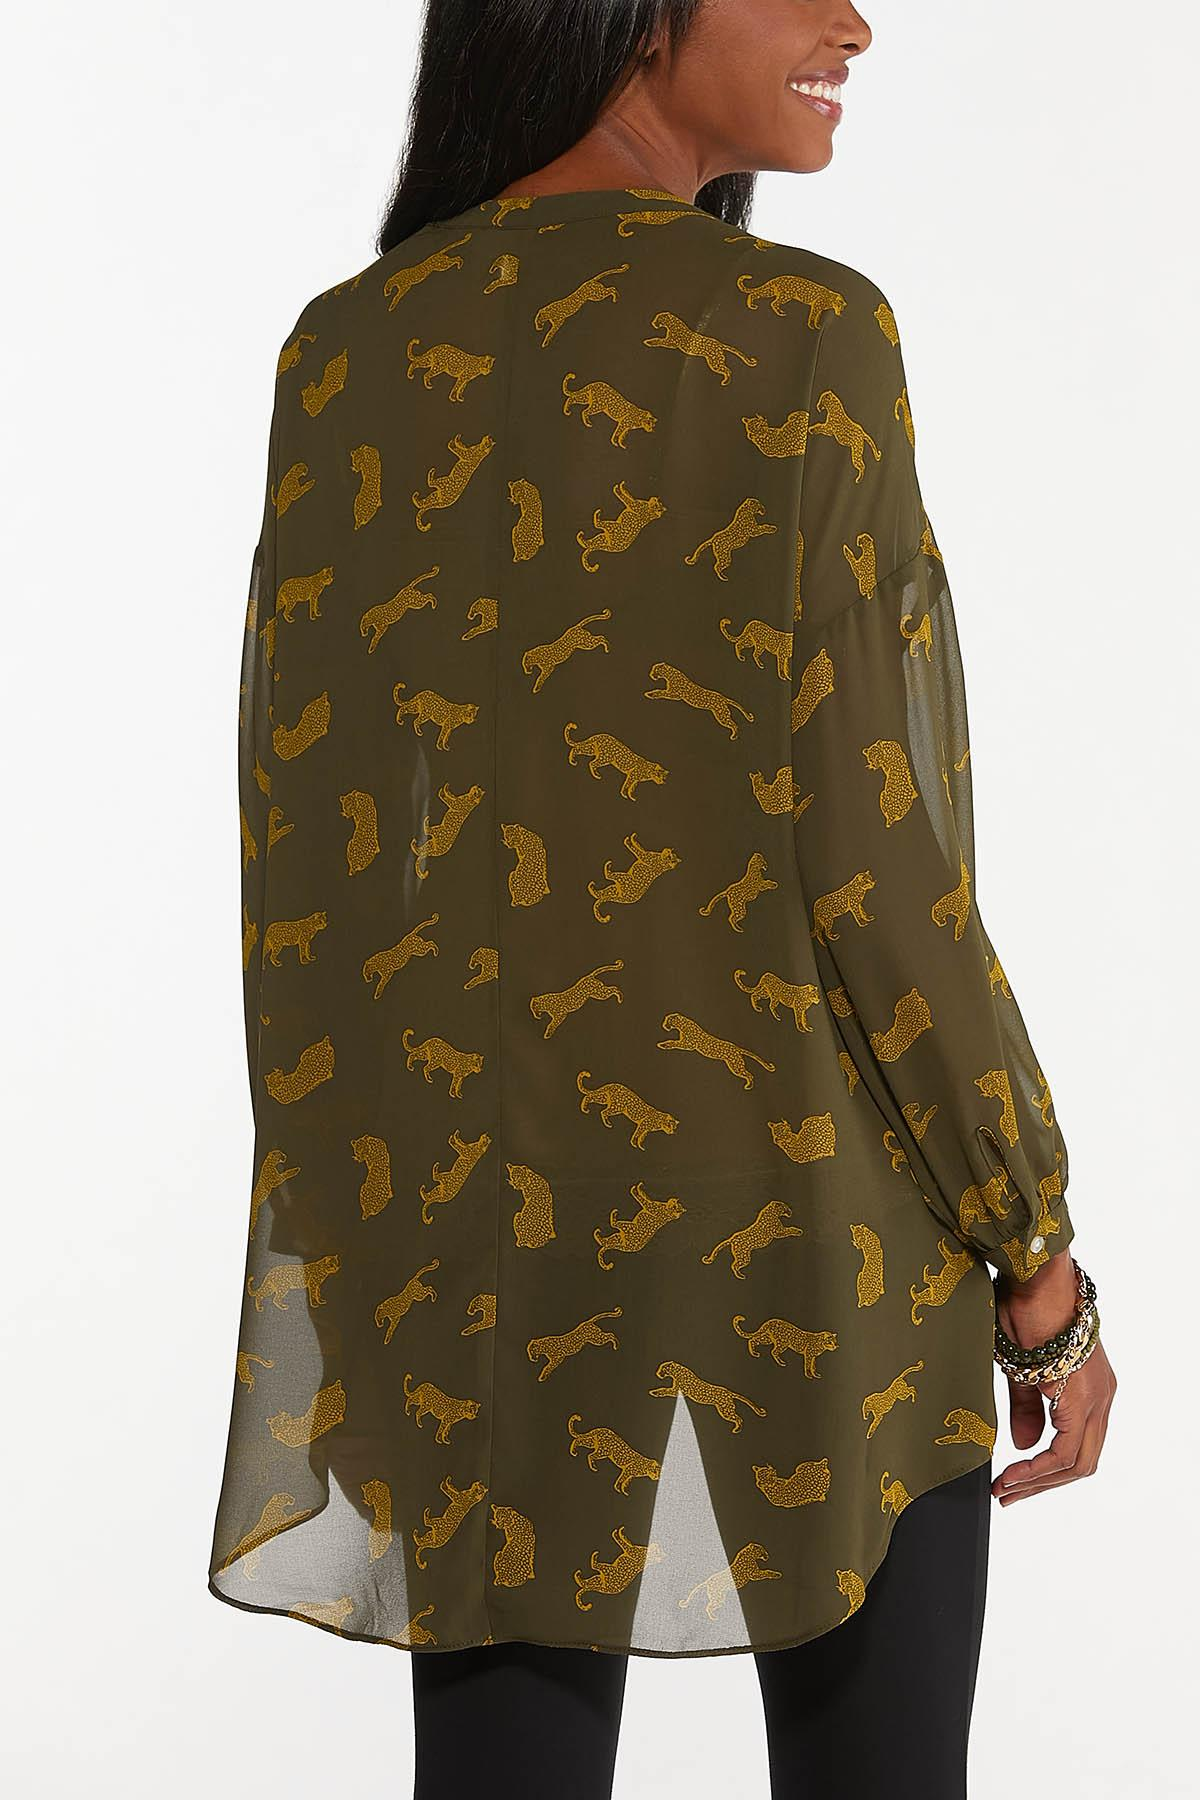 Plus Size Sheer Cheetah Tunic (Item #44674760)